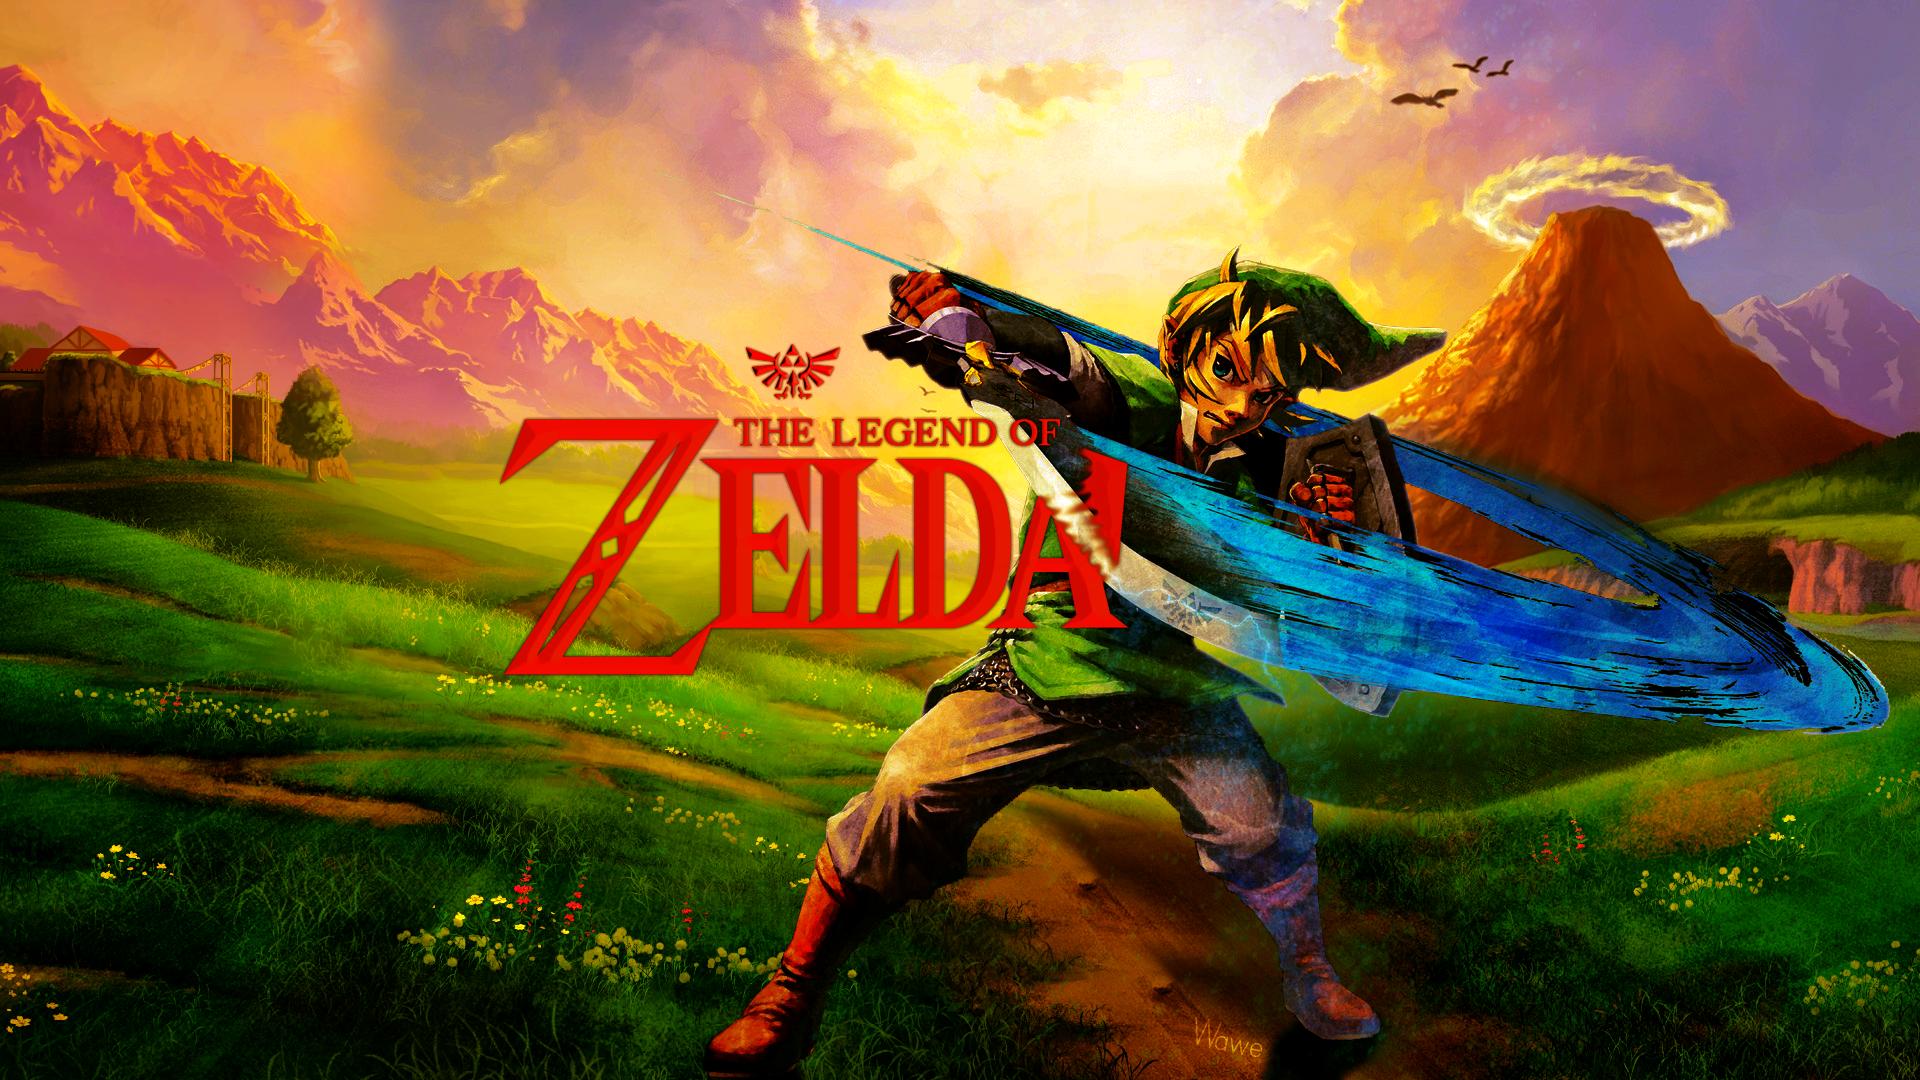 Legend of Zelda Wallpaper by WaweAKAExrel on DeviantArt